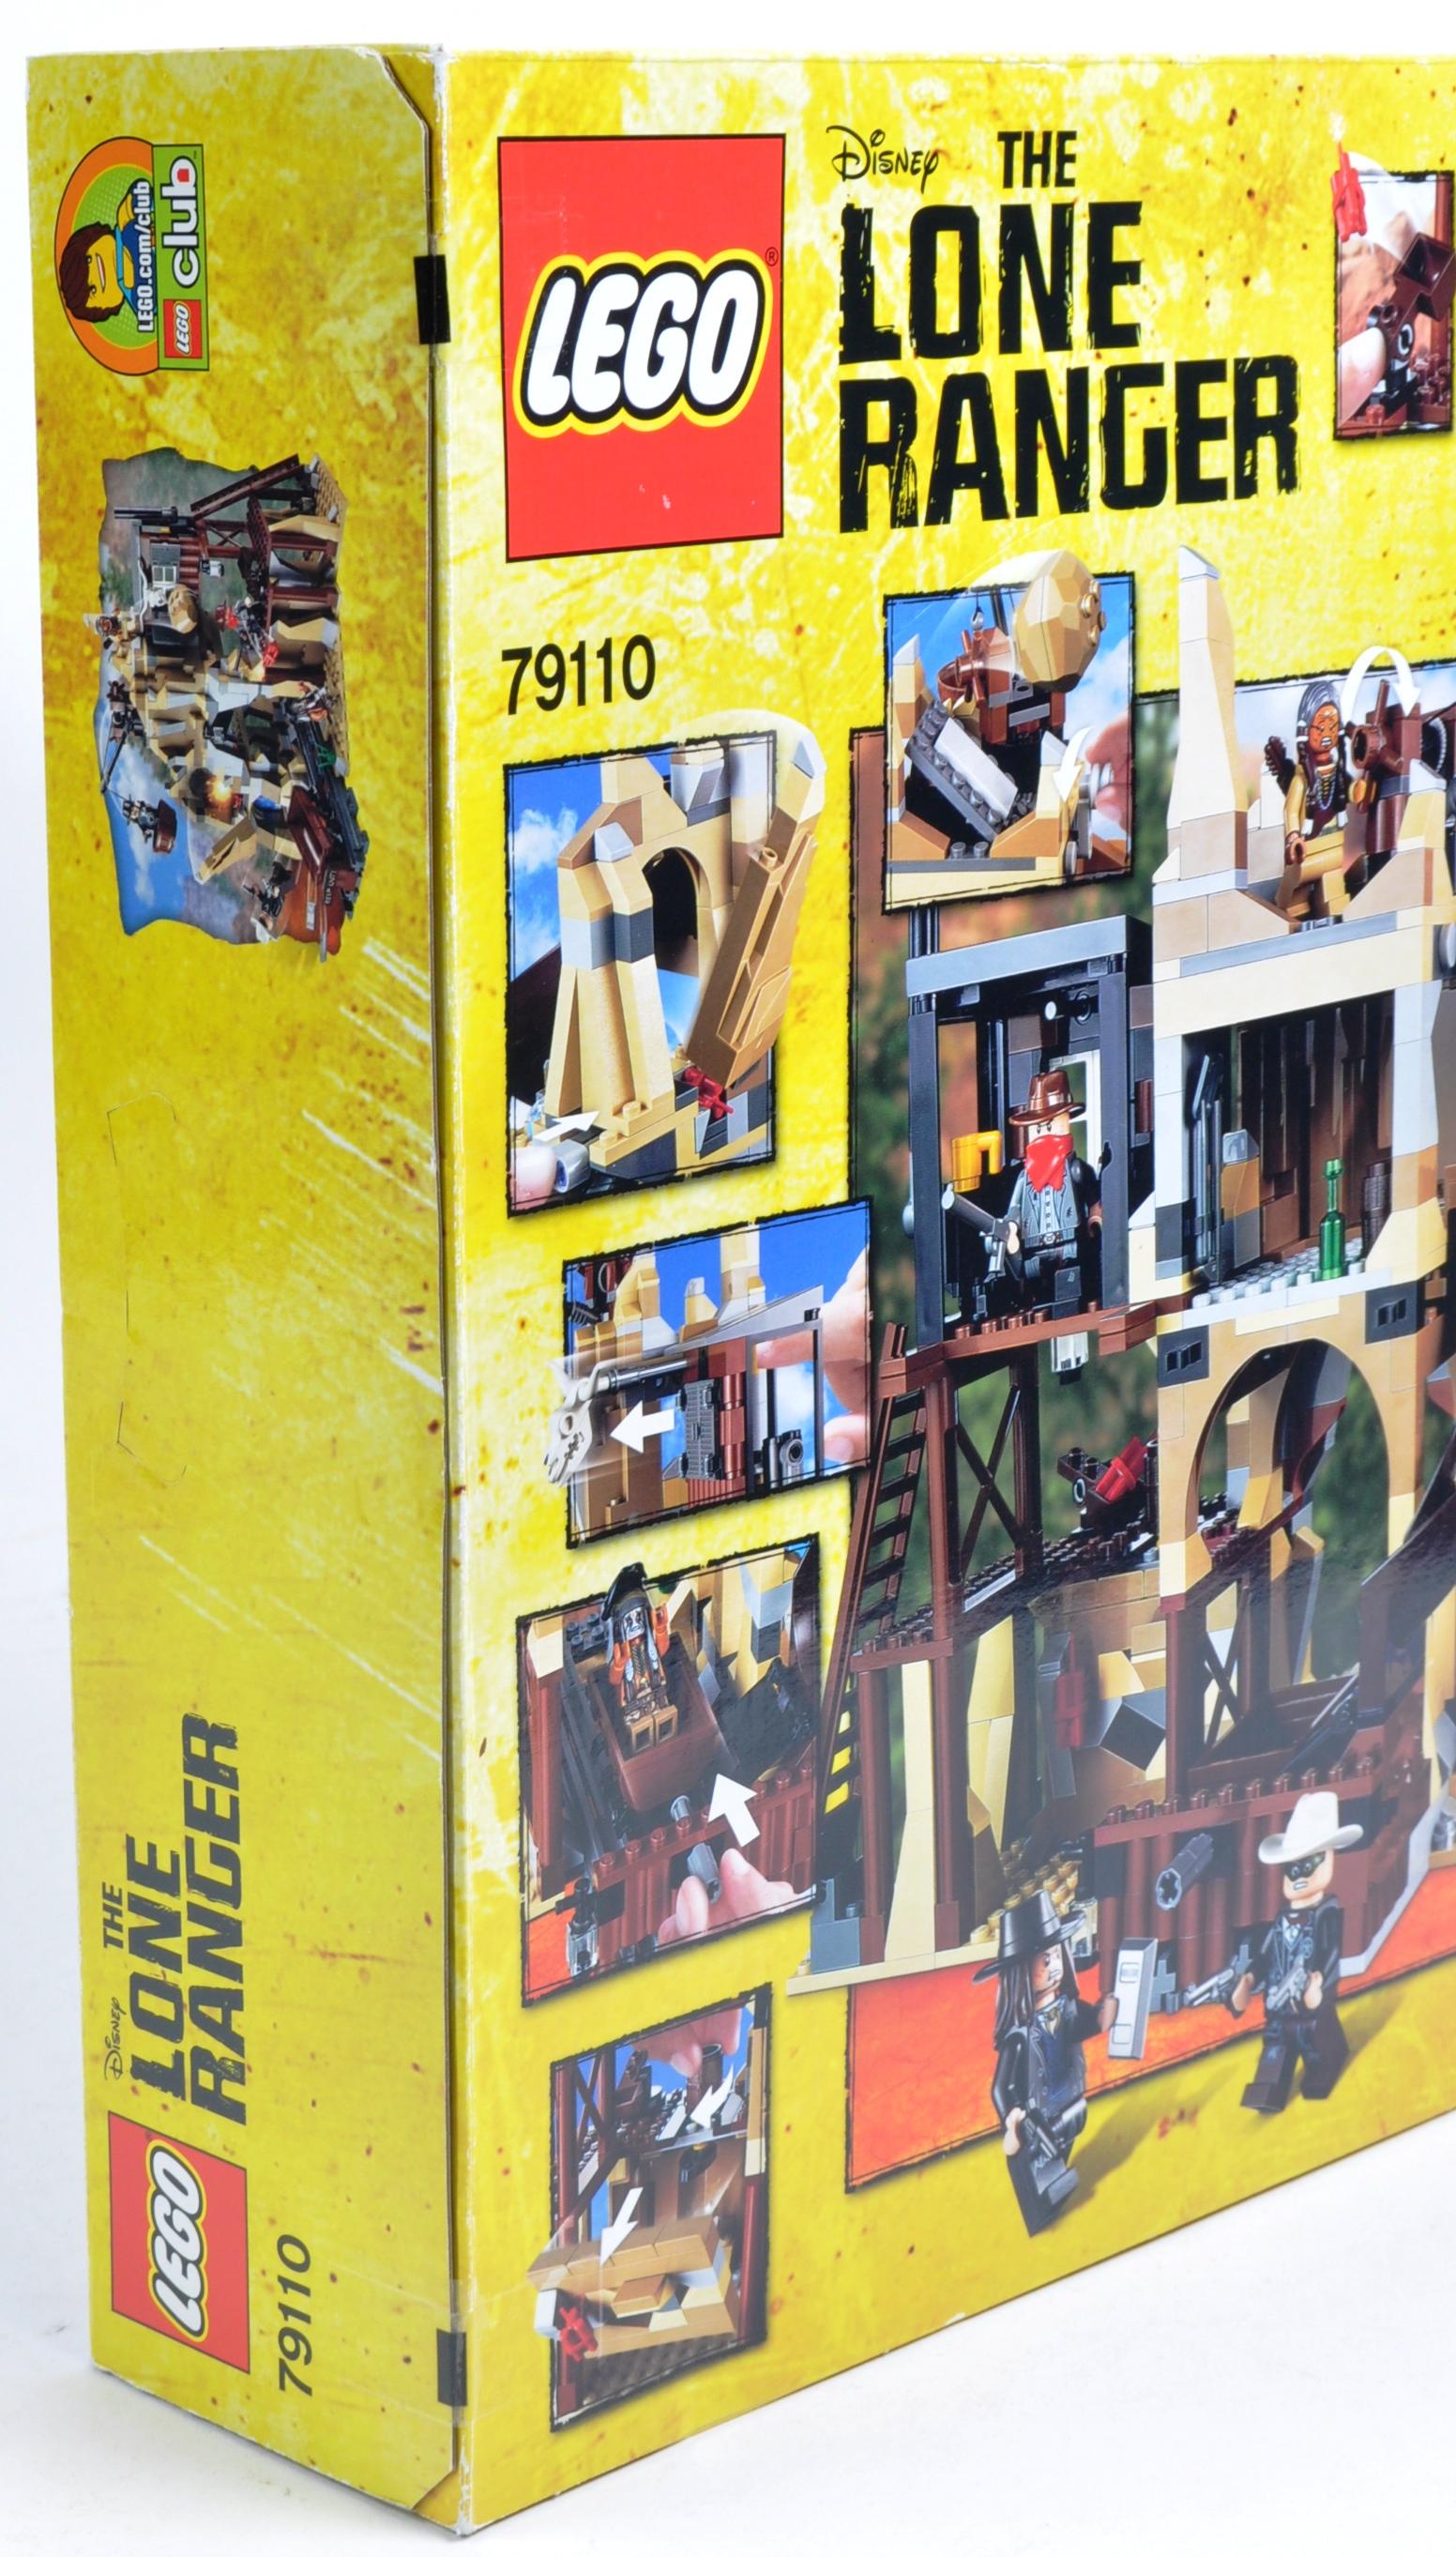 LEGO SET - THE LONE RANGER - 79110 - SILVER MINE SHOOTOUT - Image 4 of 4